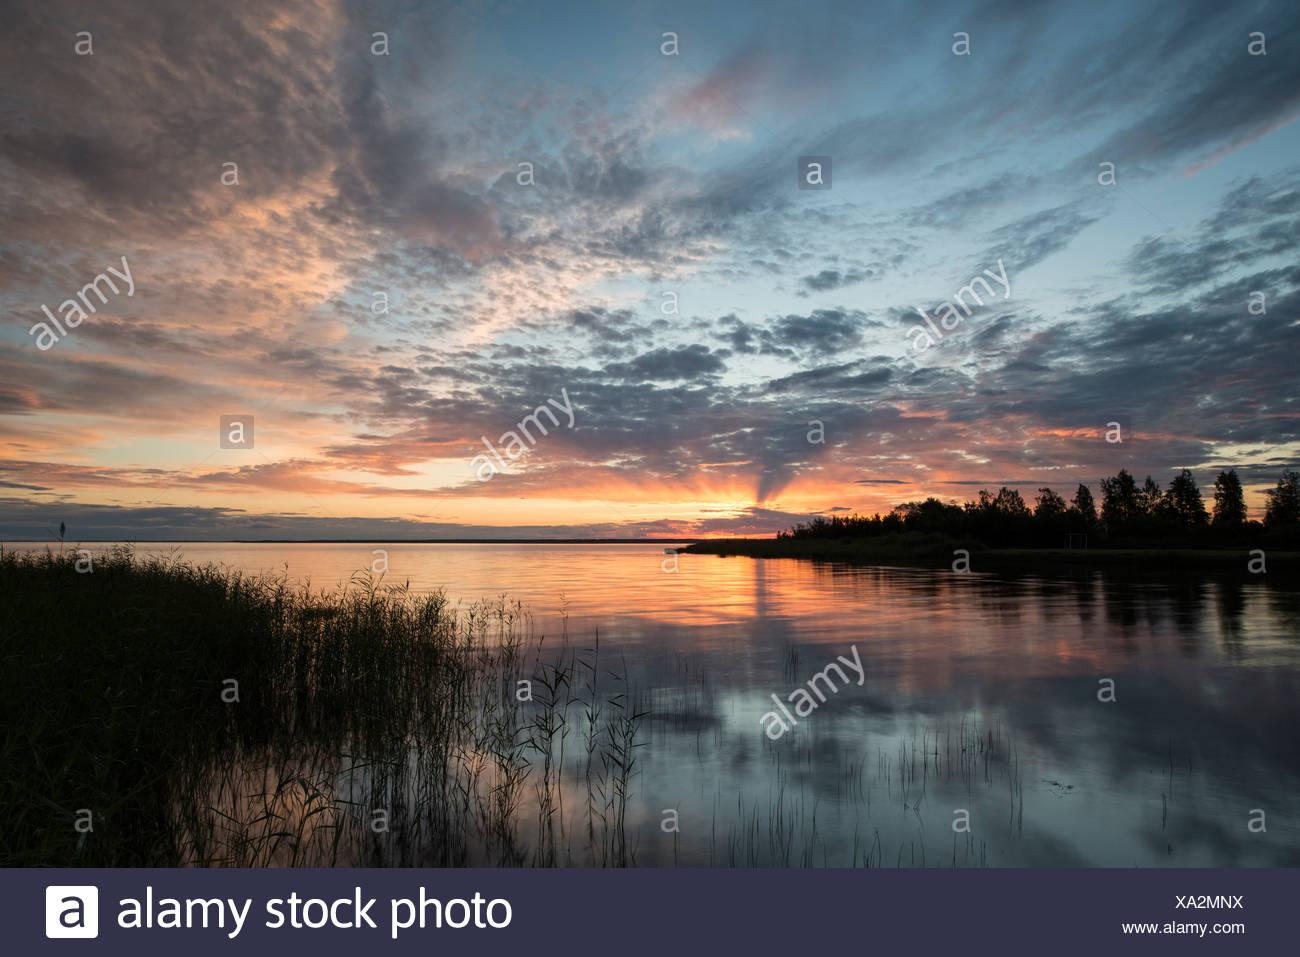 Lidköping Sweden Northern Europe Scandinavia lake sundown sunset southwest Sweden Vänern Vänern lake water Europe European - Stock Image